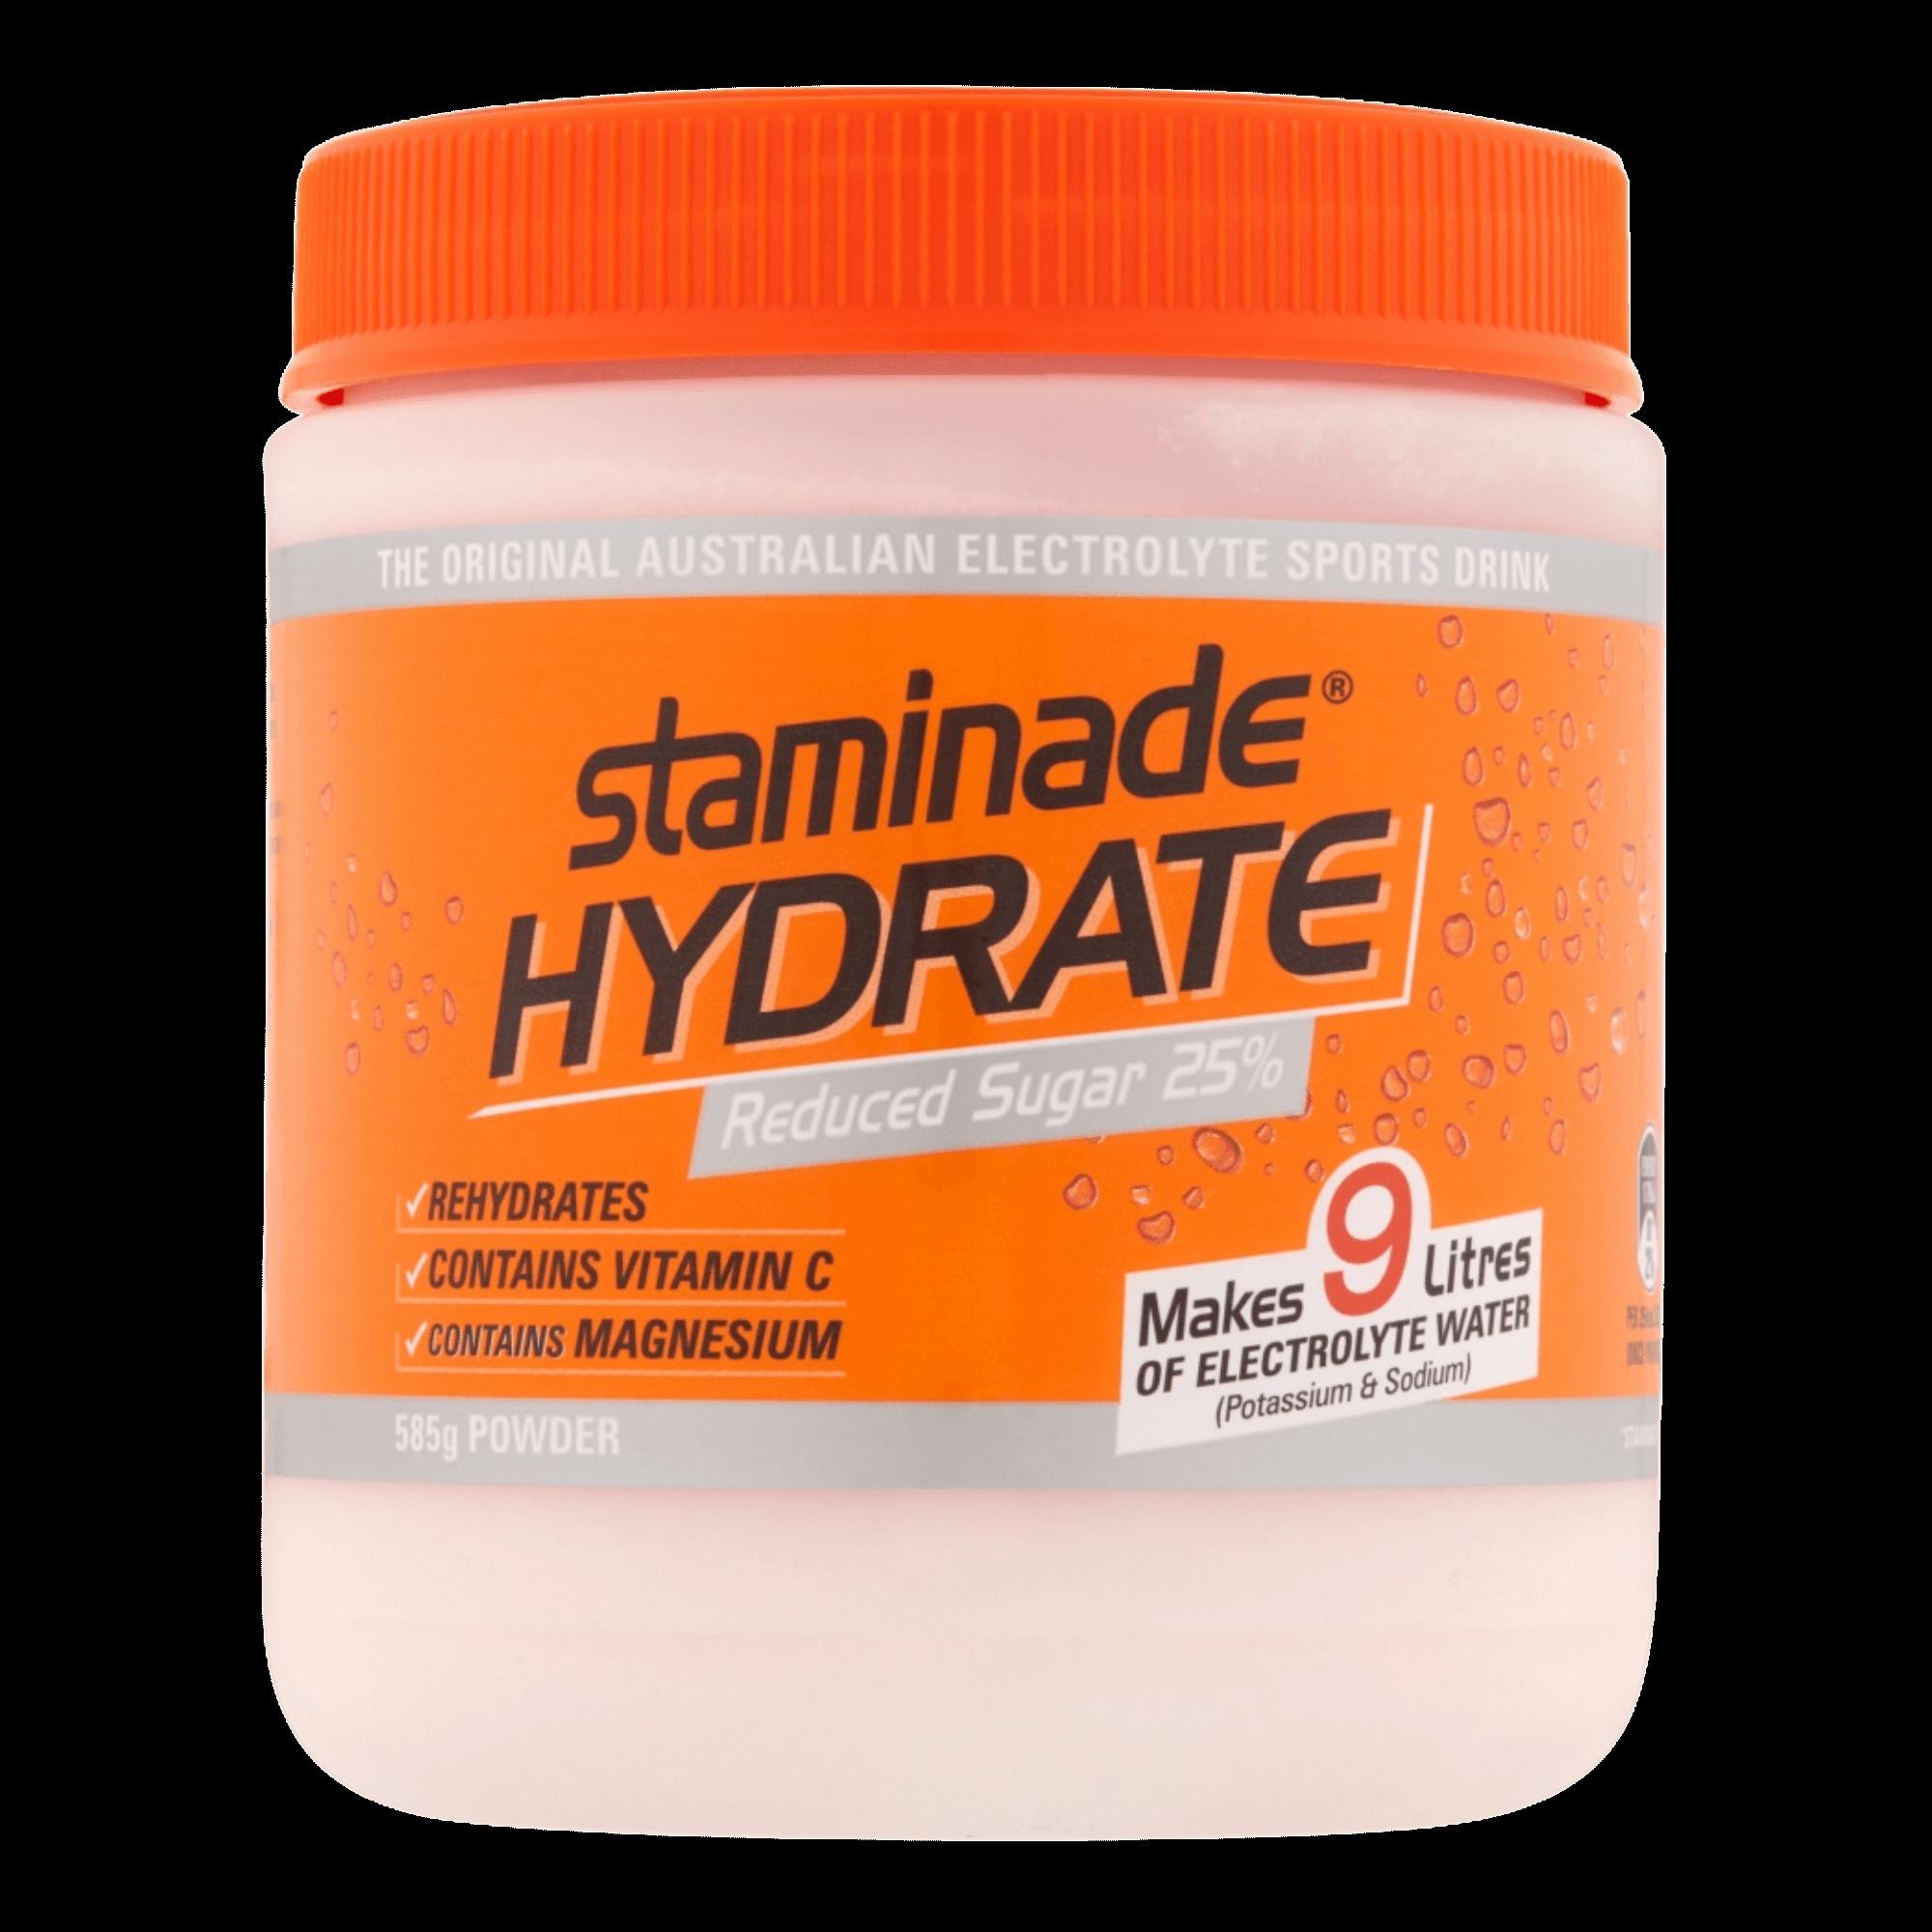 Staminade Hydrate Orange 25% Reduced Sugar*